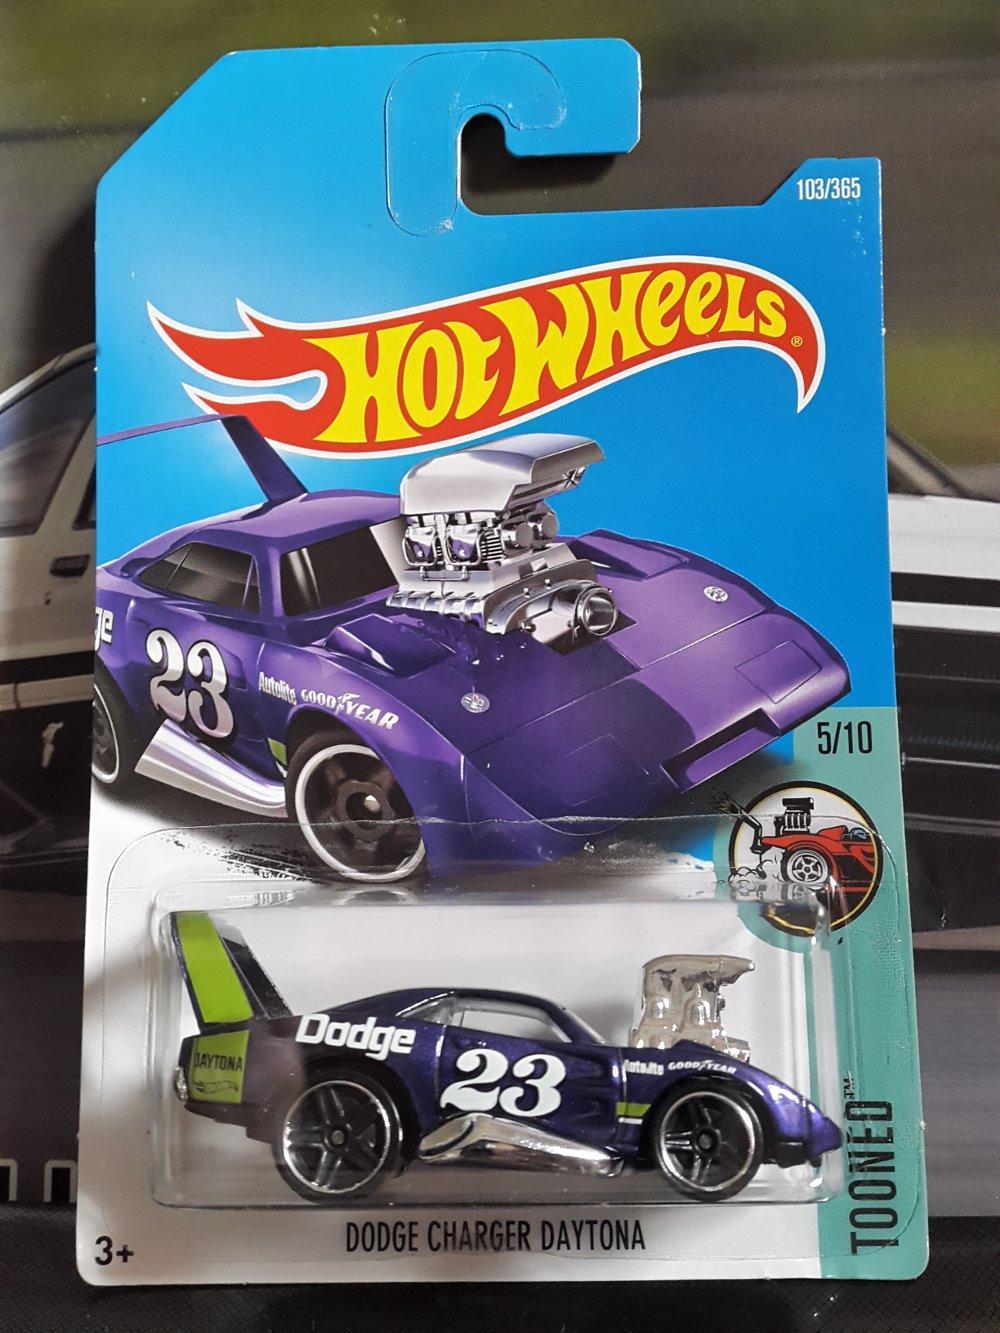 Dodge Charger Daytona Goodyear purple Hotwheels # Favorit Toys favorit_toys